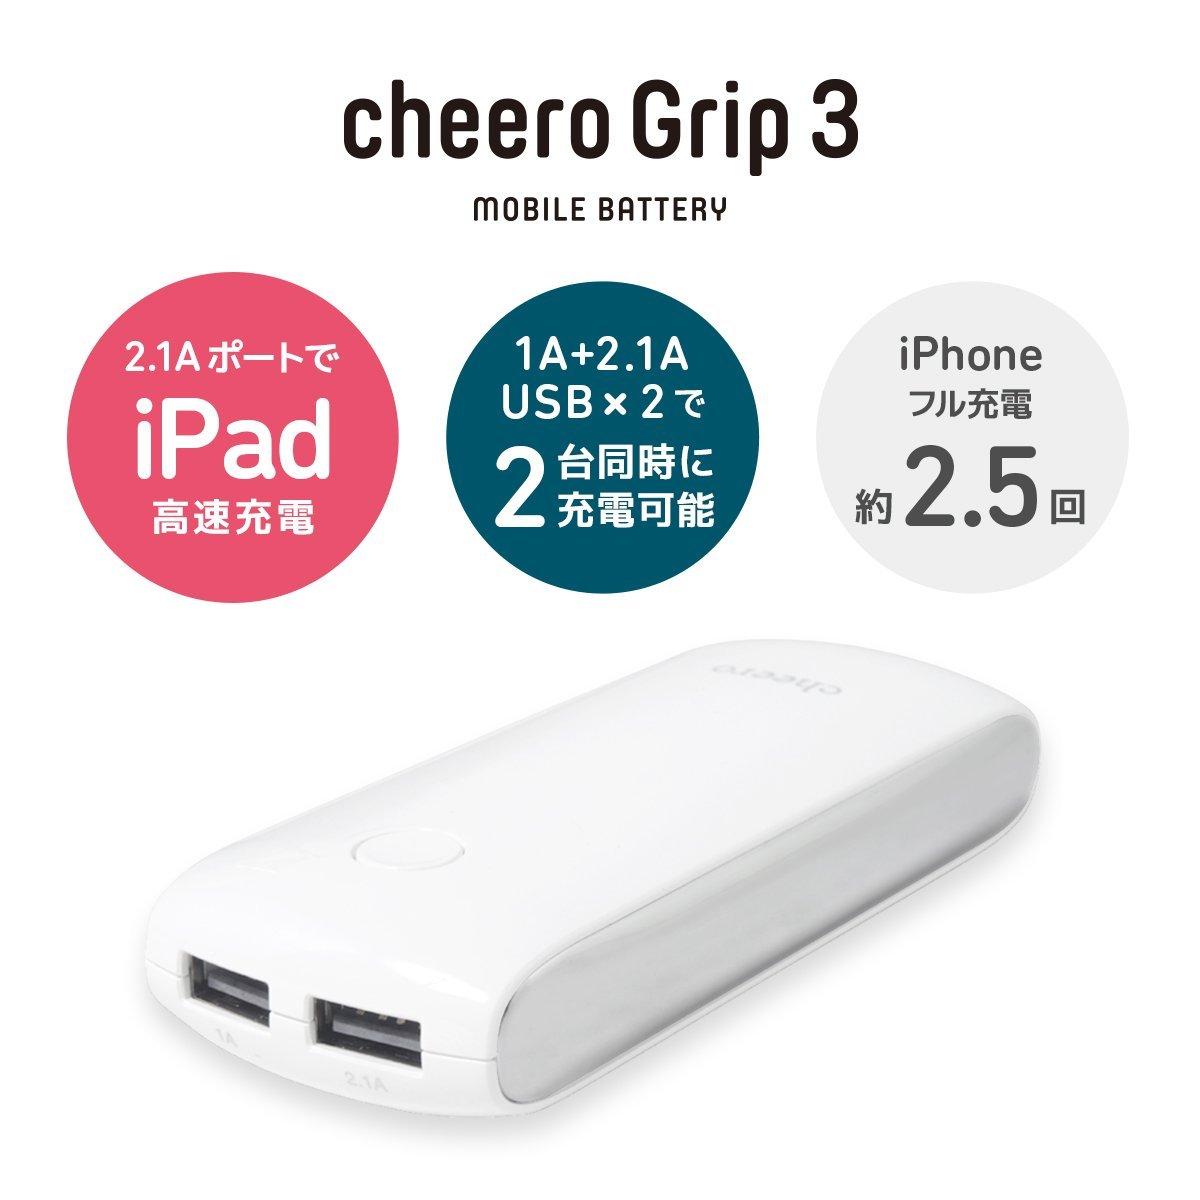 cheero-grip-3_release-1